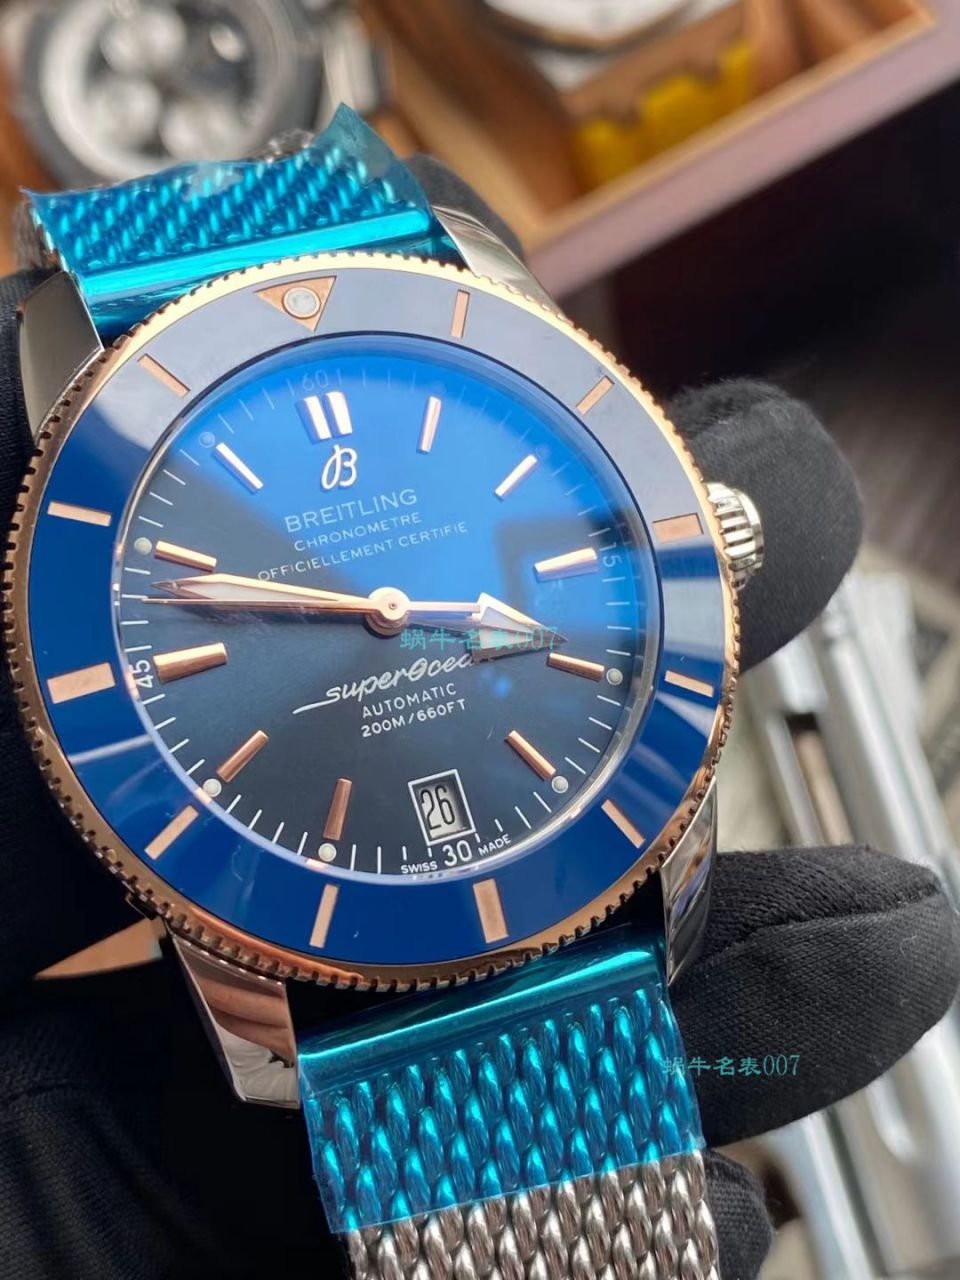 TW厂百年灵超级海洋文化超A高仿手表AB2010161C1A1,AB2010121B1S1腕表 / BL207